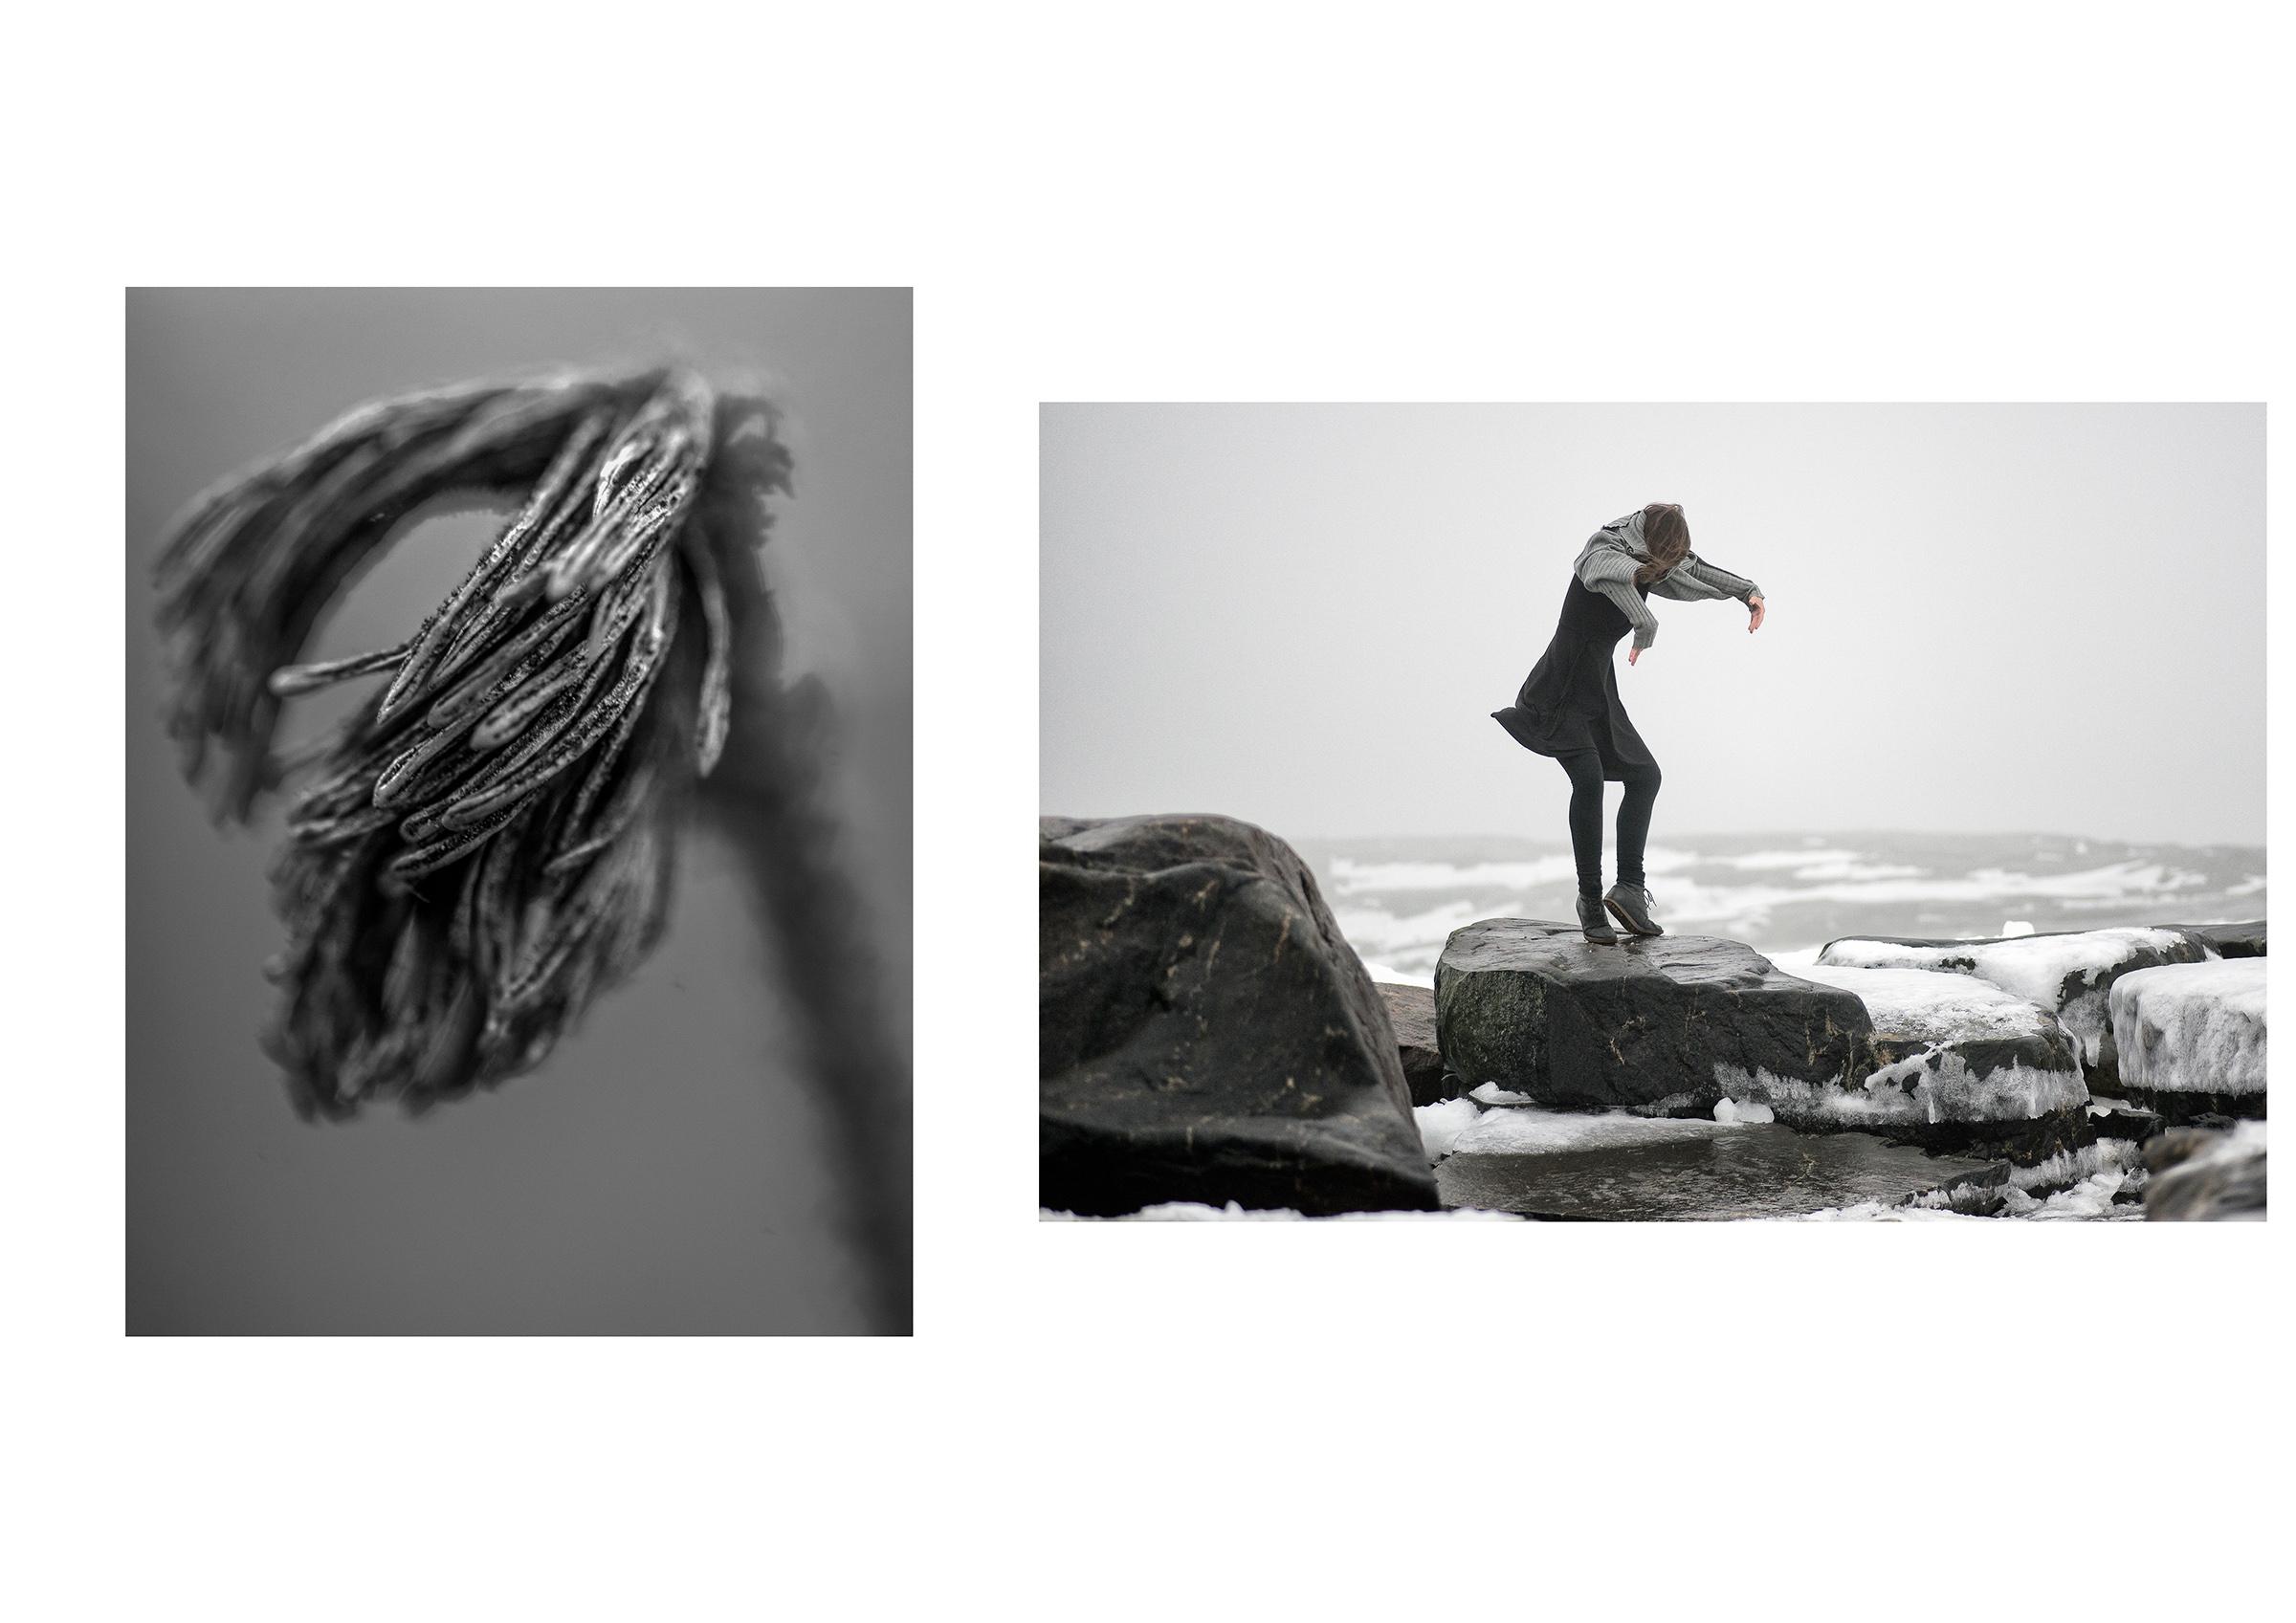 Photo 🅰:   CREATURES of the ARCHIPELAGO     Nauvo Archipelago, Baltic Sea - July 2016 Photo 🅱:   SEA CHANGE SERIES     Uunisaari, Helsinki, Finland 2016 - dancer: Kristiina Turtiainen